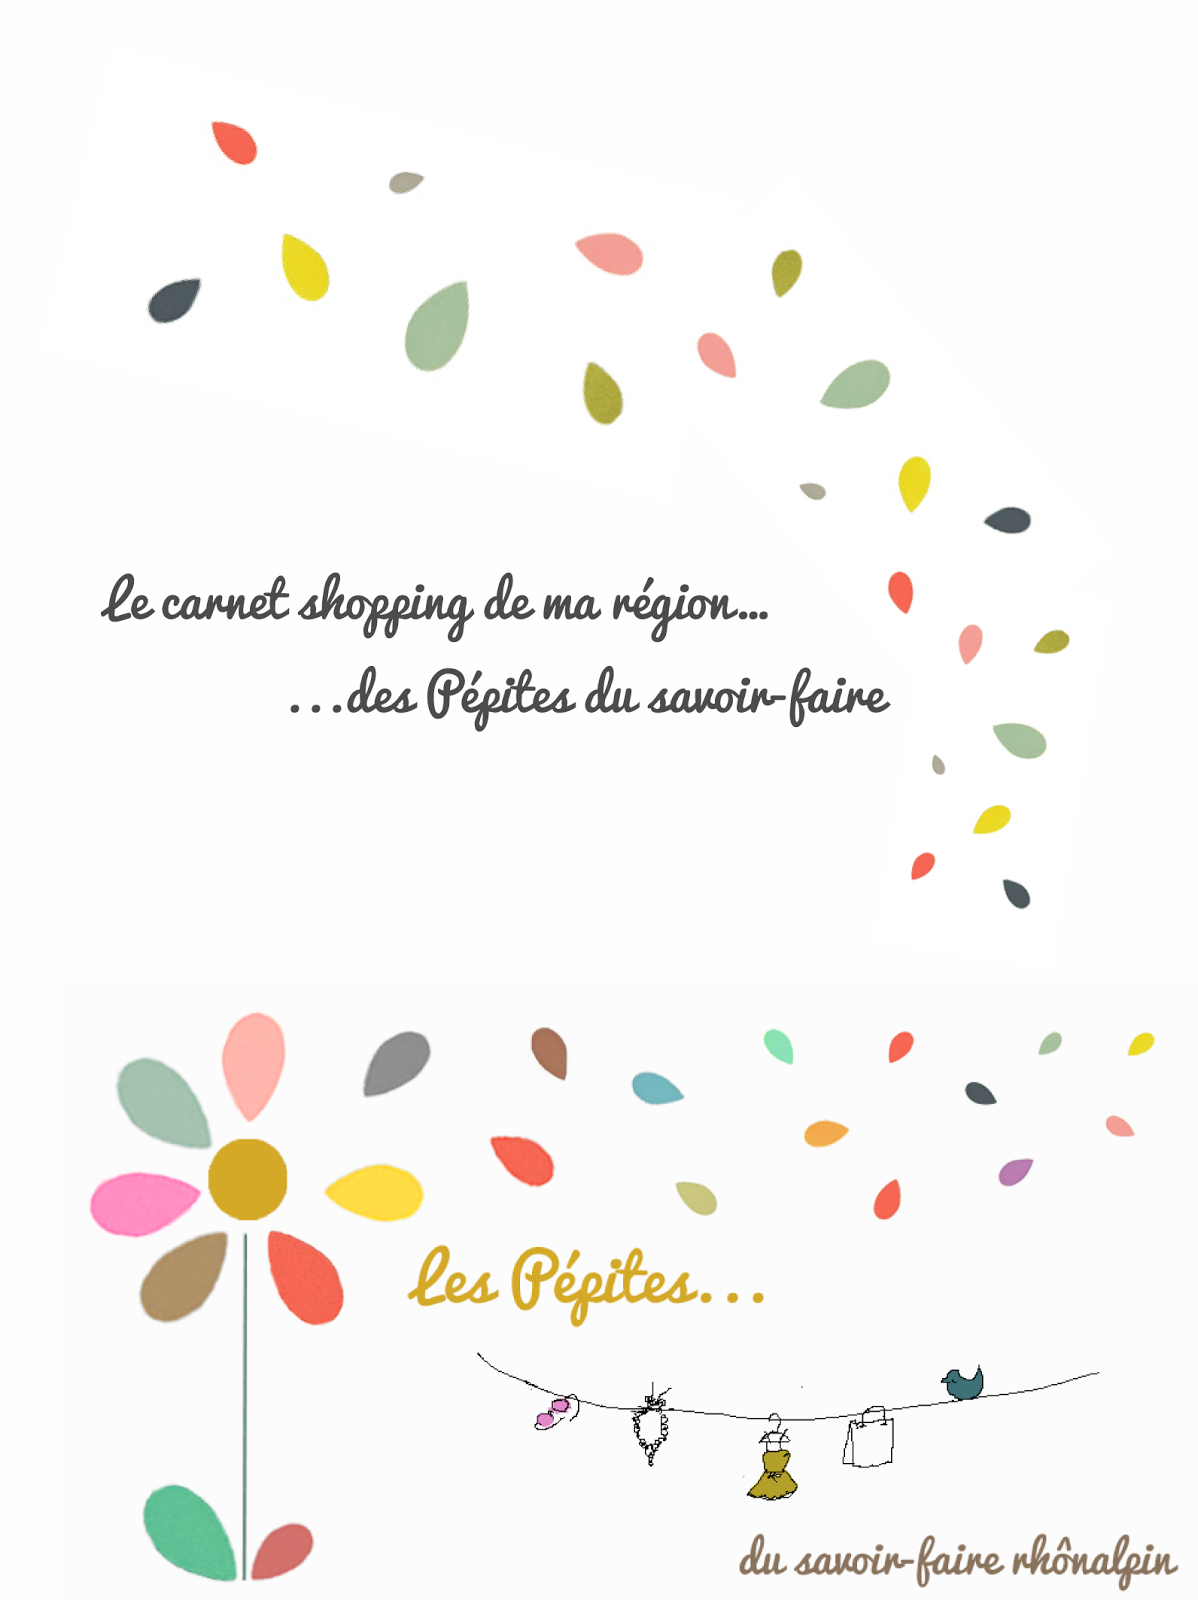 Le Carnet shopping 2015